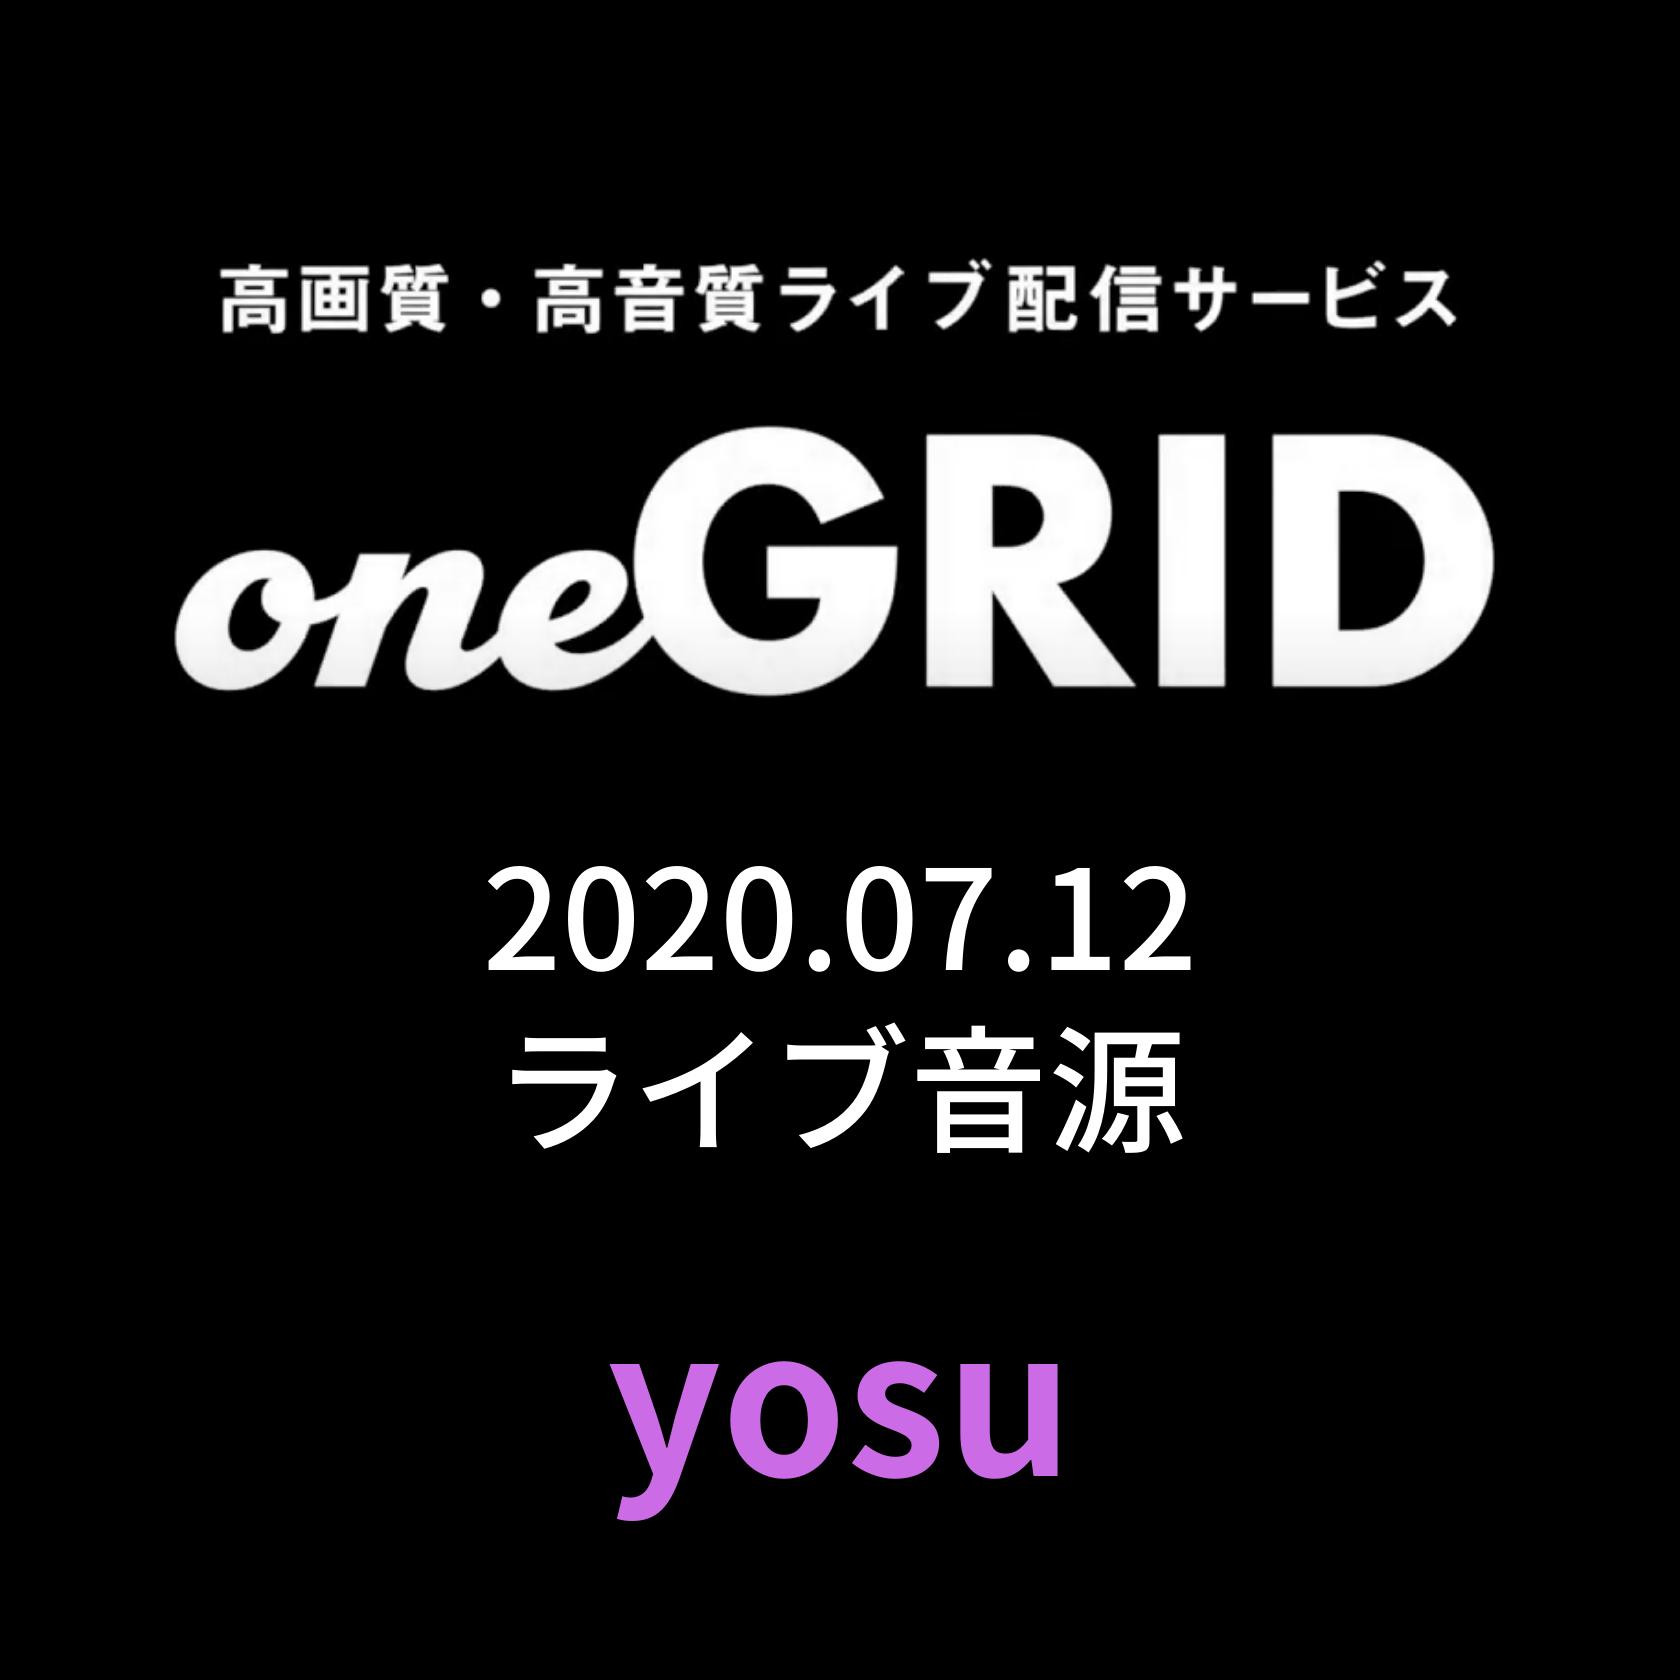 7/12 yosu Live音源